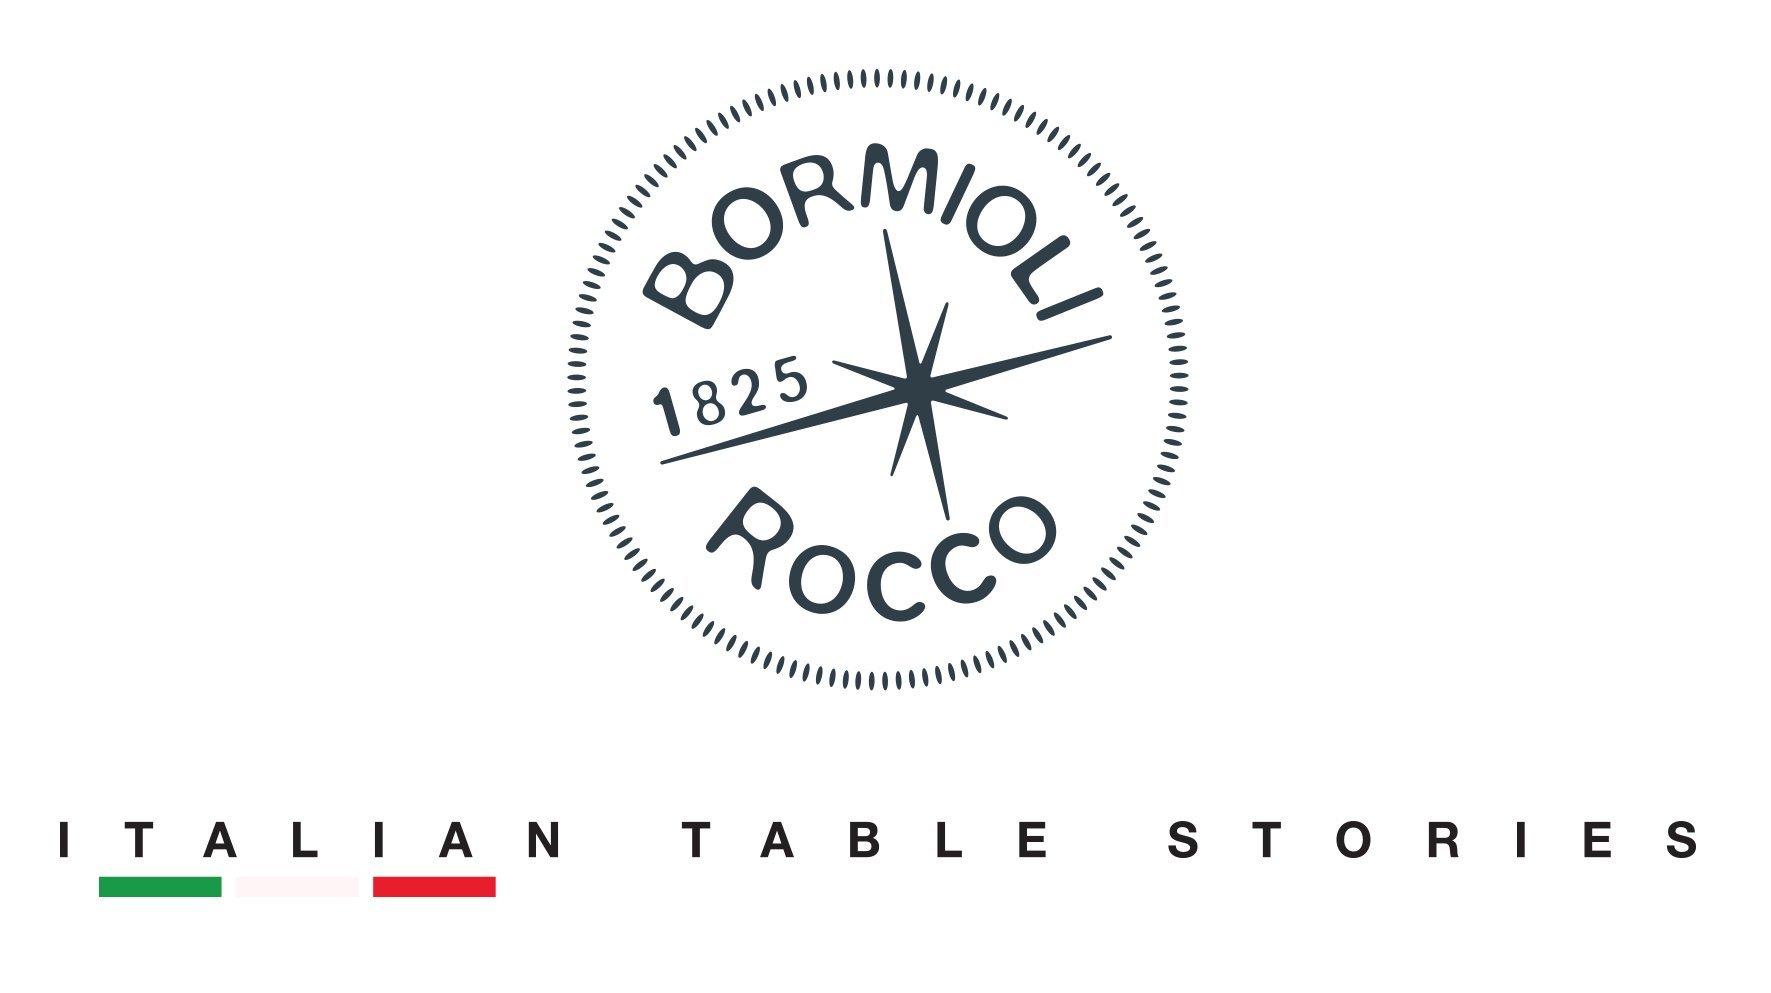 Bormioli Rocco 387595G10021990 Romantic Tumbler - 10.25 oz - 4 Piece Set, Clear